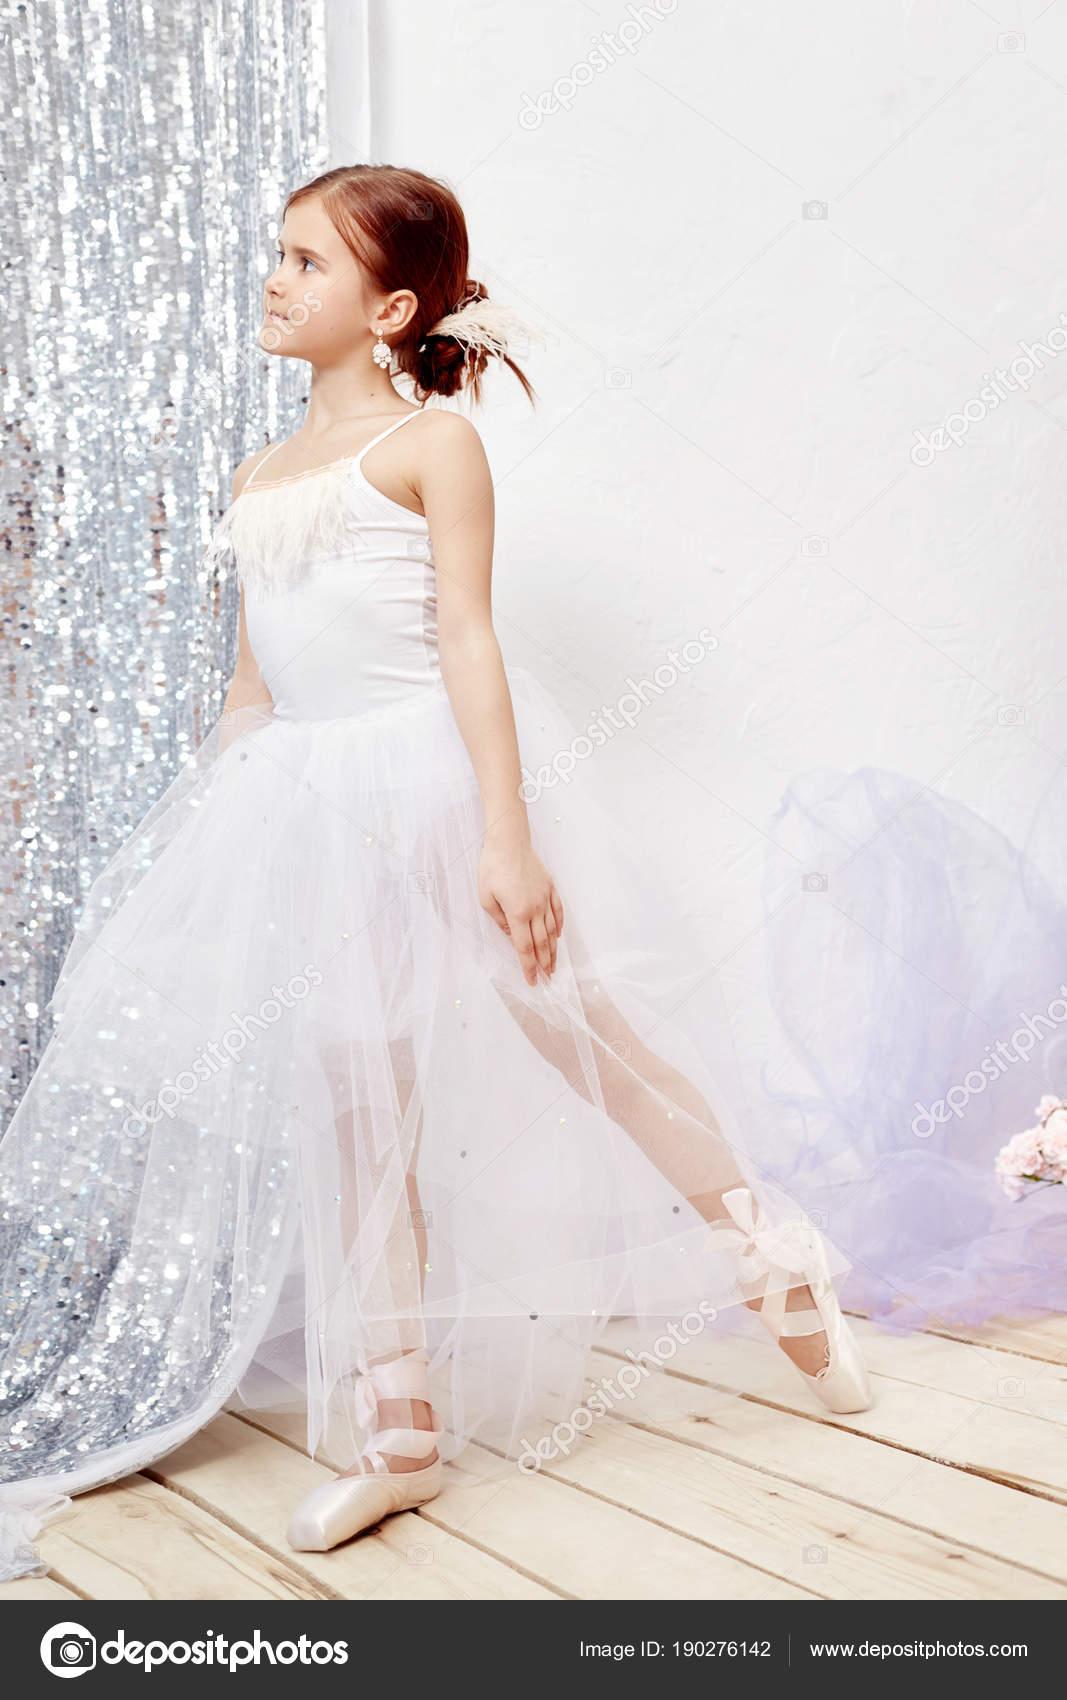 prima ballet. Young ballerina girl is preparing for a ballet ...